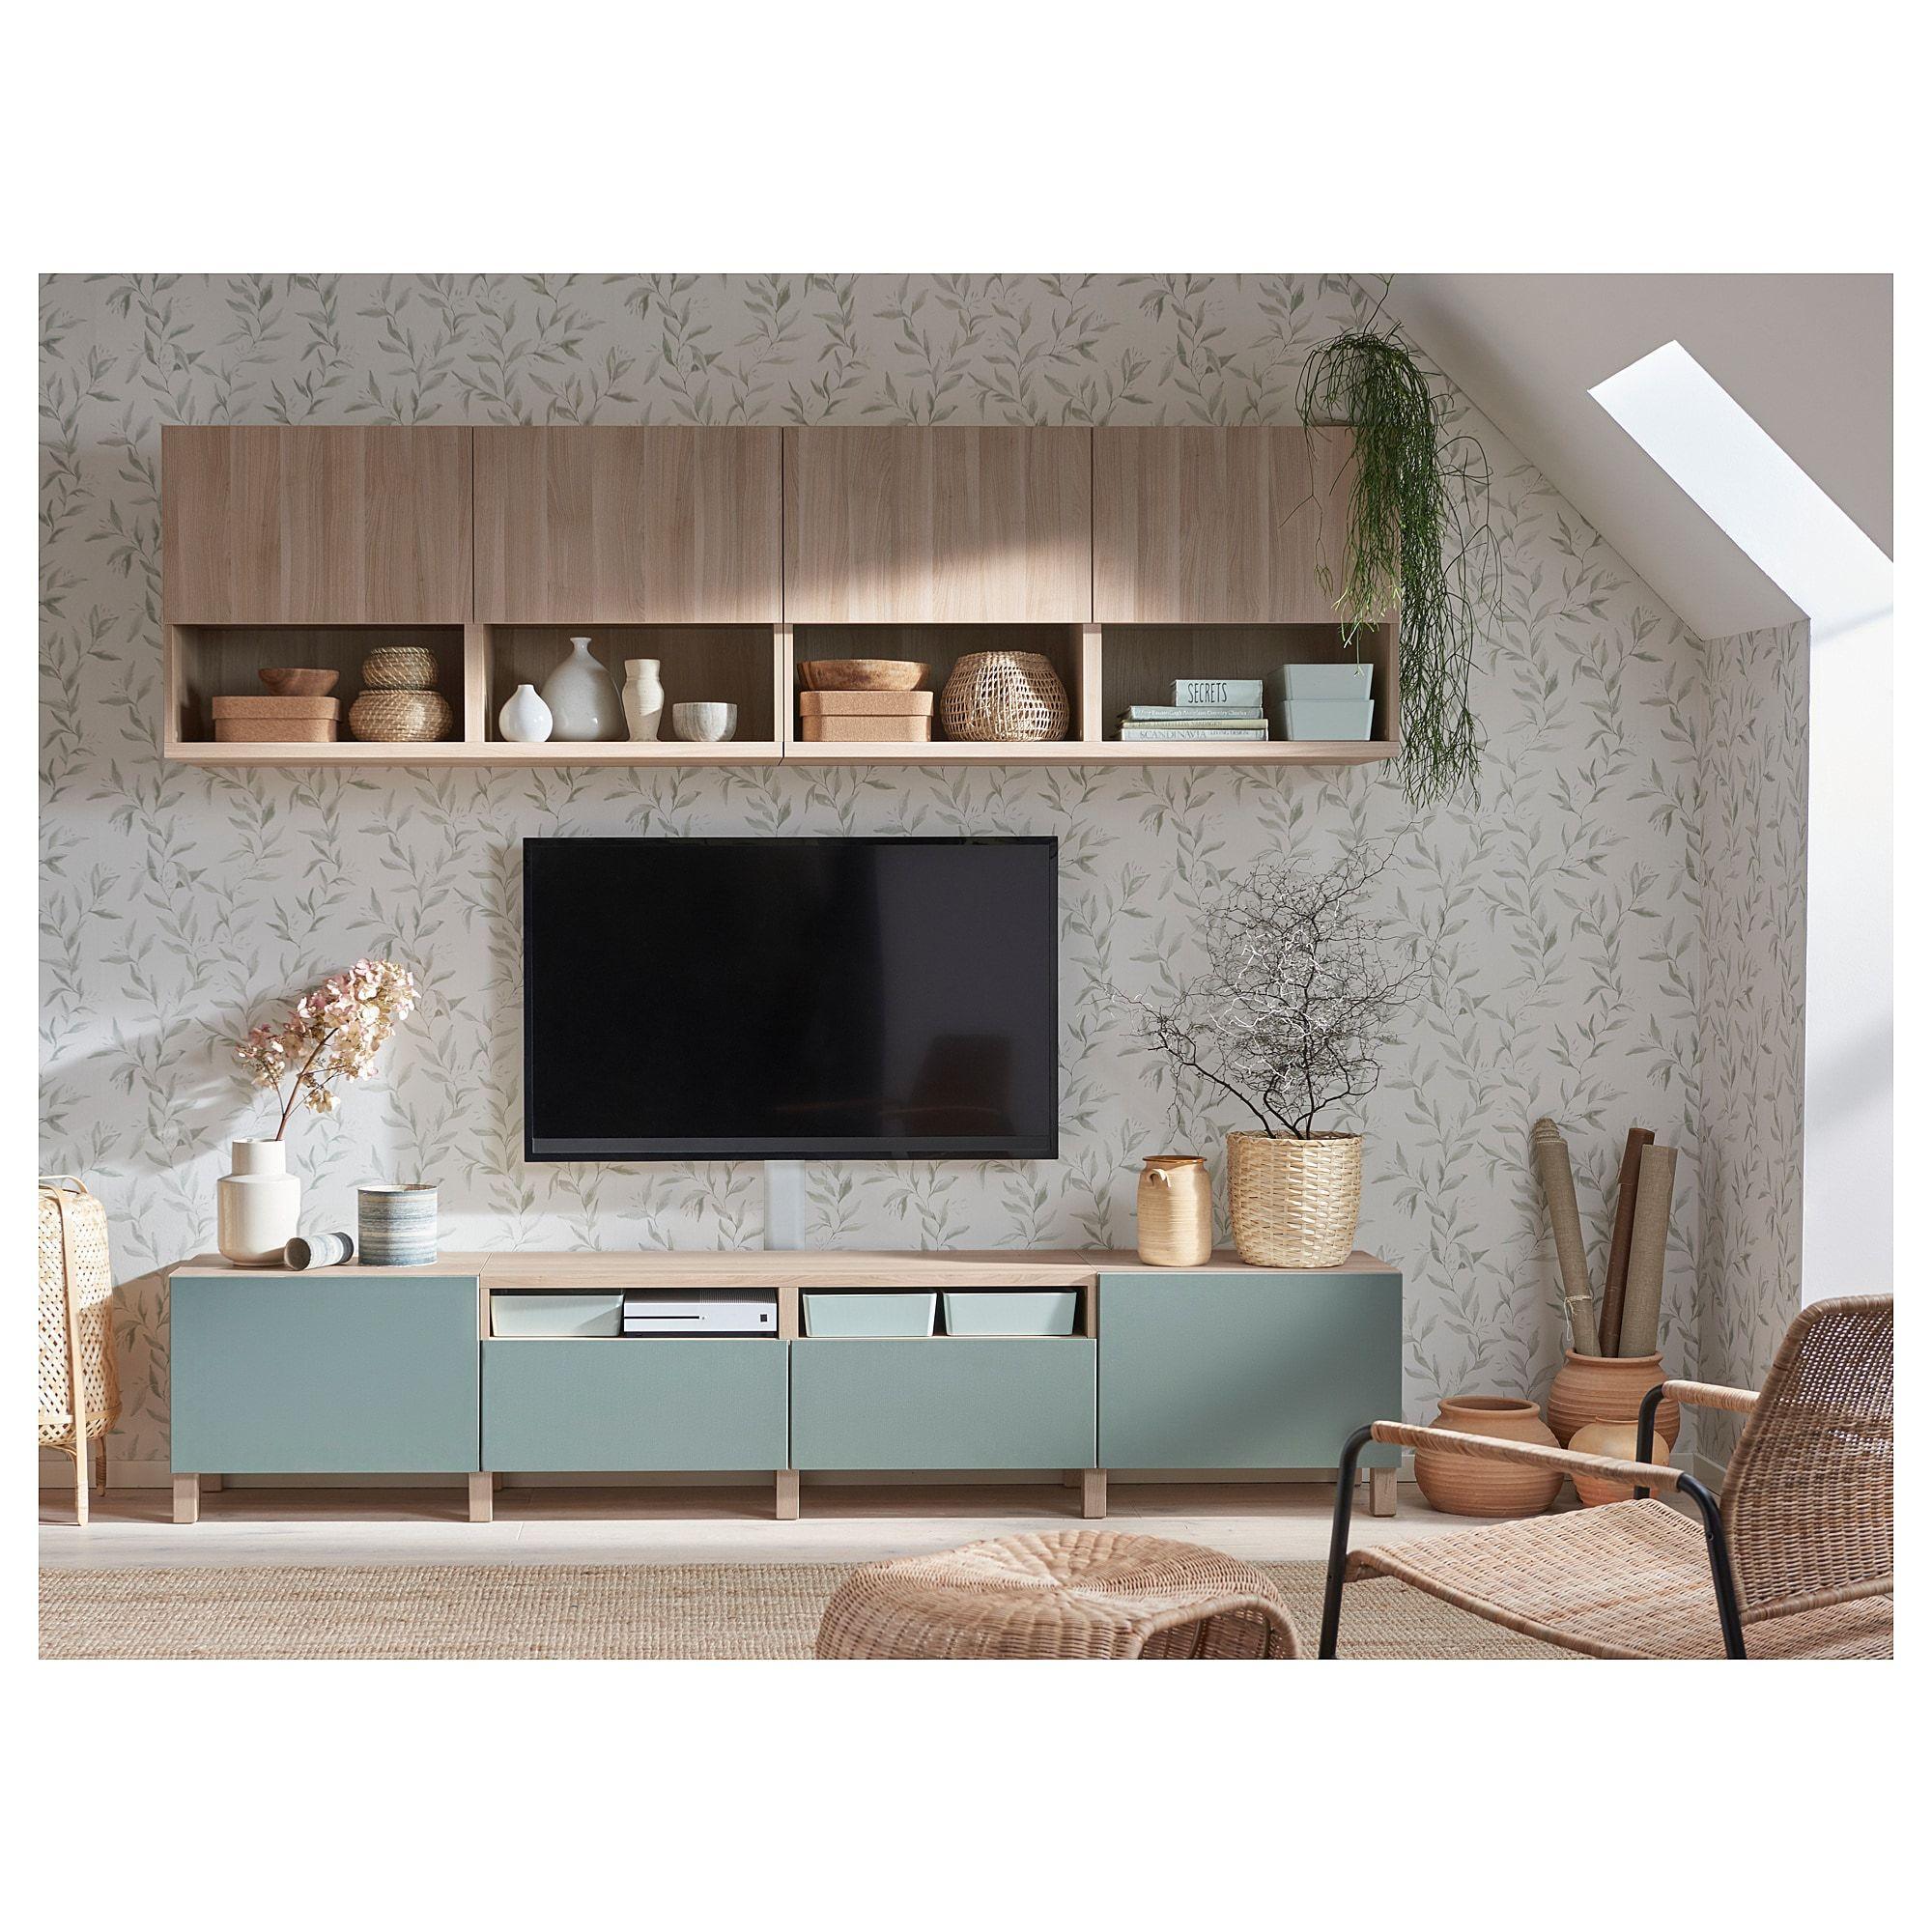 Besta Tv Storage Combination Walnut Effect Light Gray Lappviken